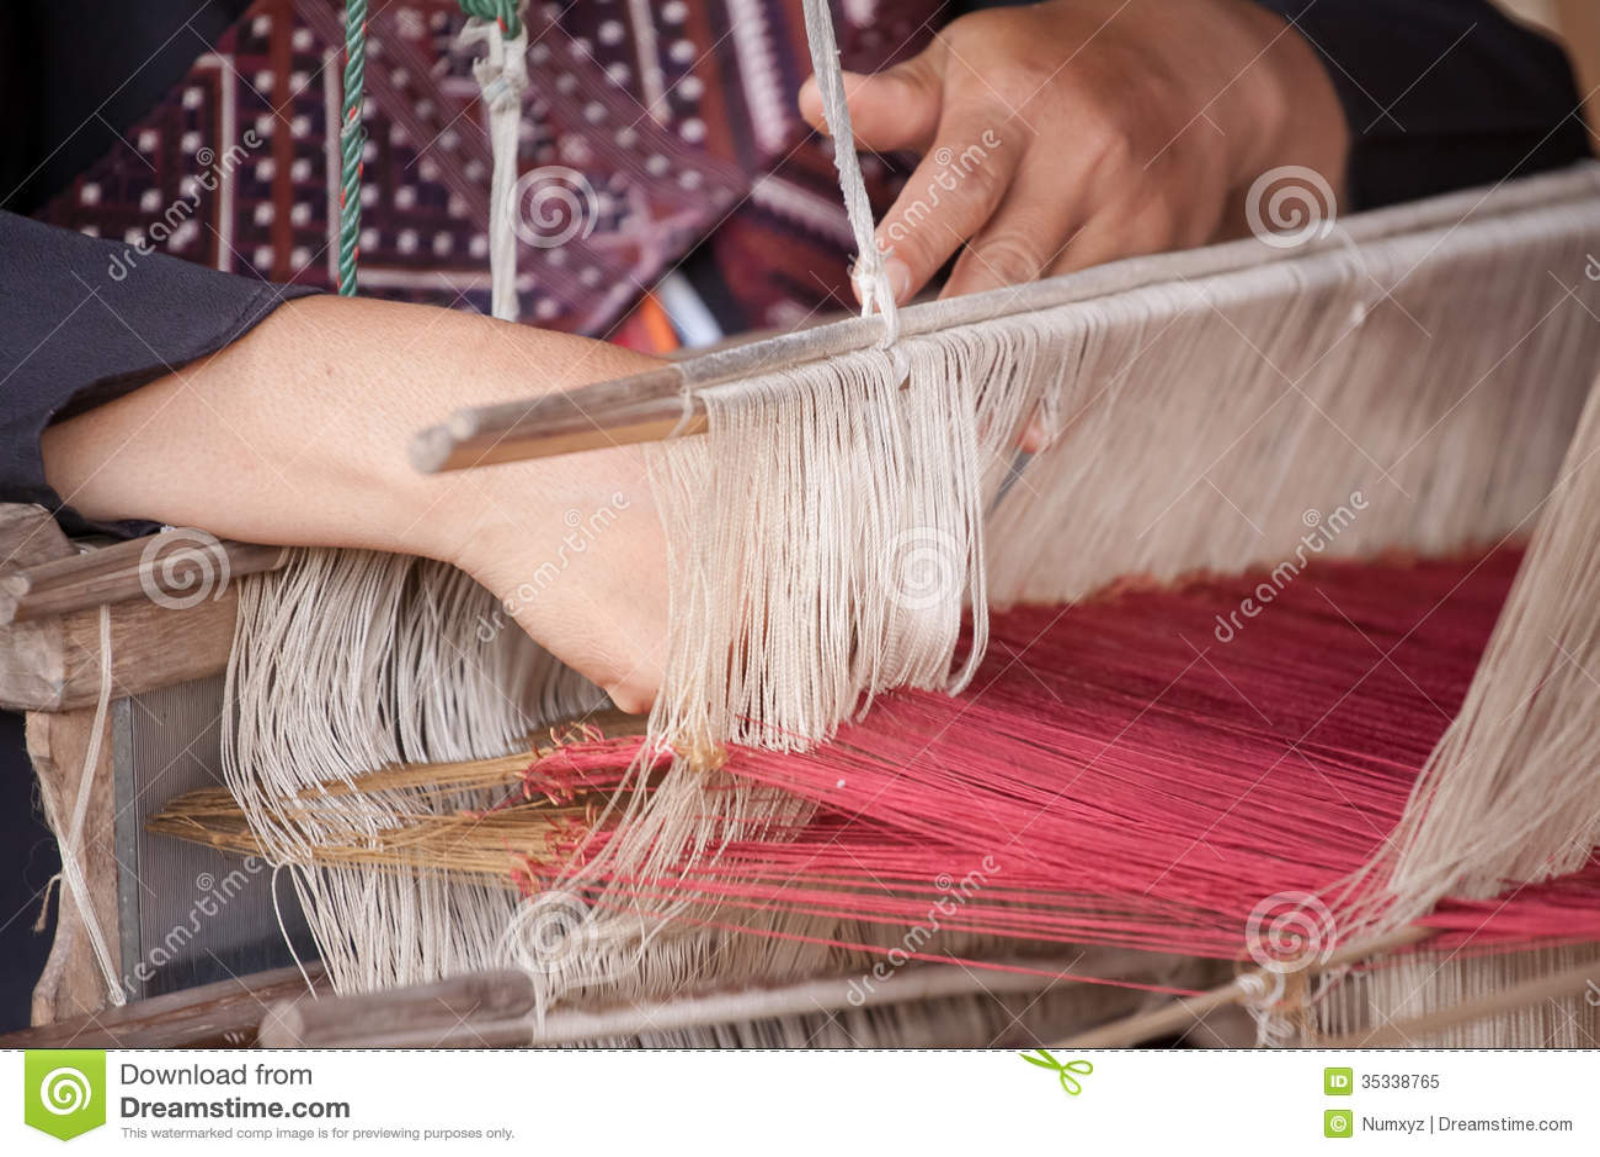 Thai Silk Weaving Royalty Free Stock Photo - Image: 35338765